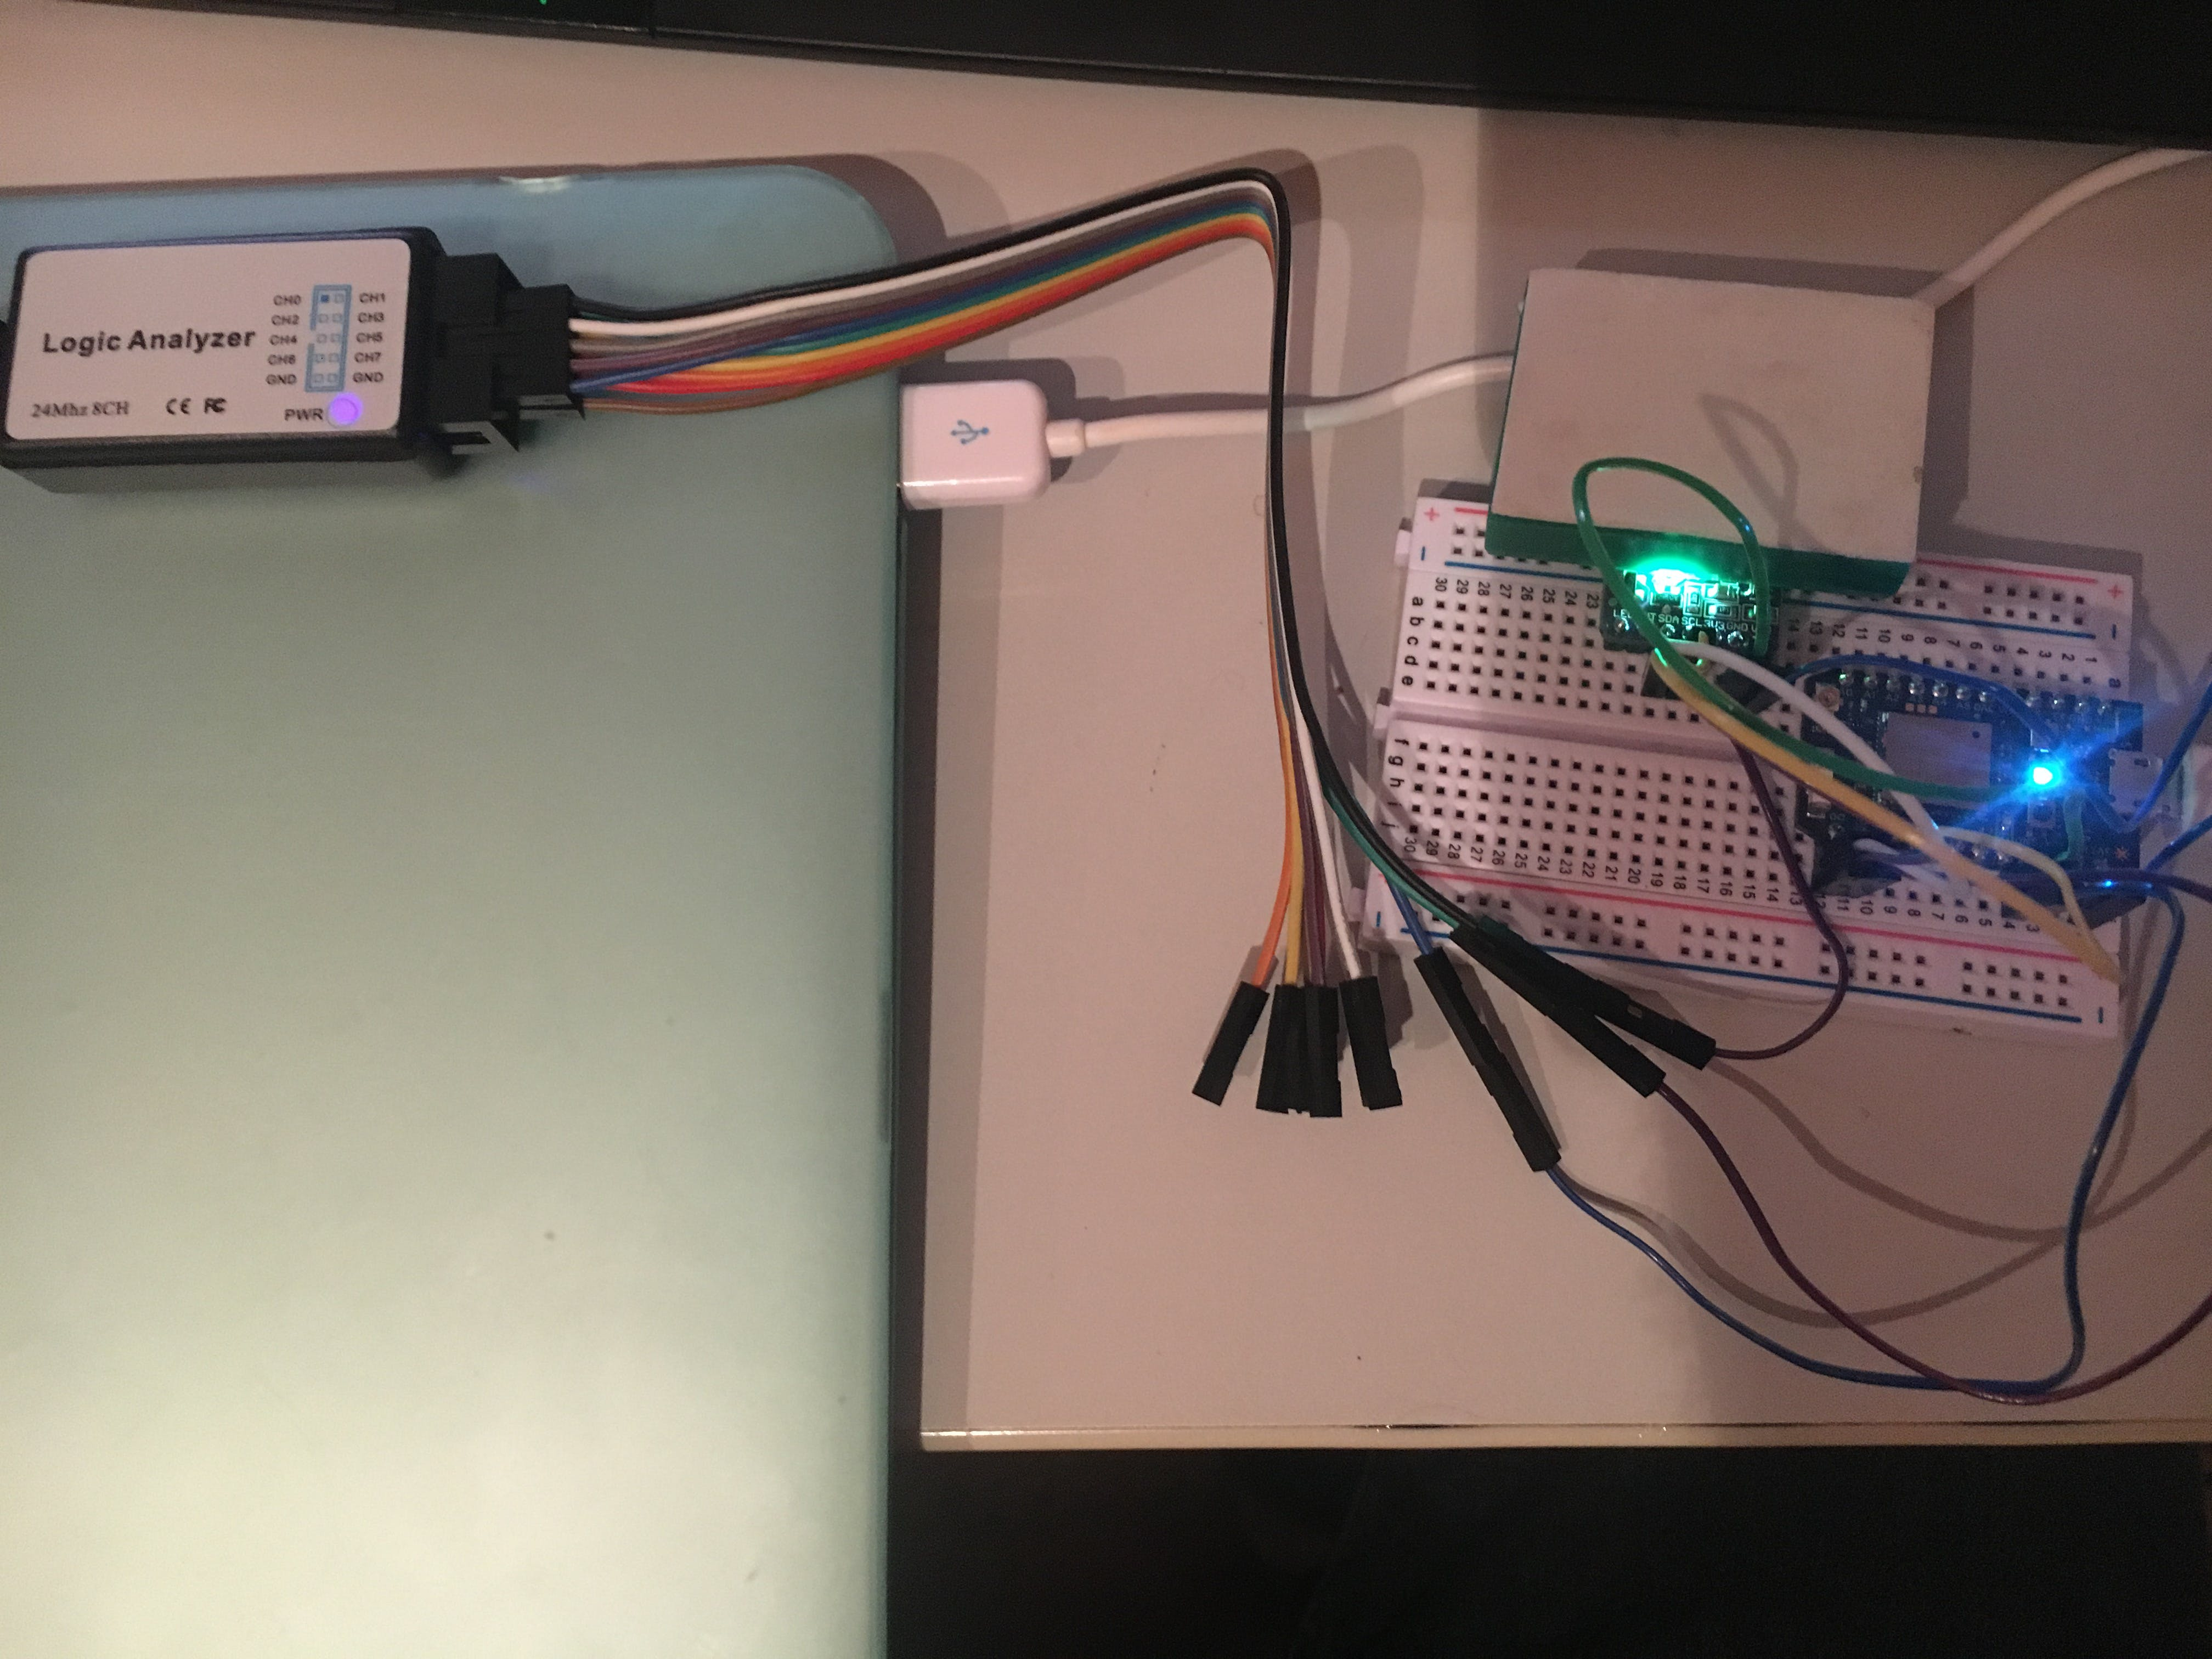 full circuit with LA and RGB color sensor on I2C